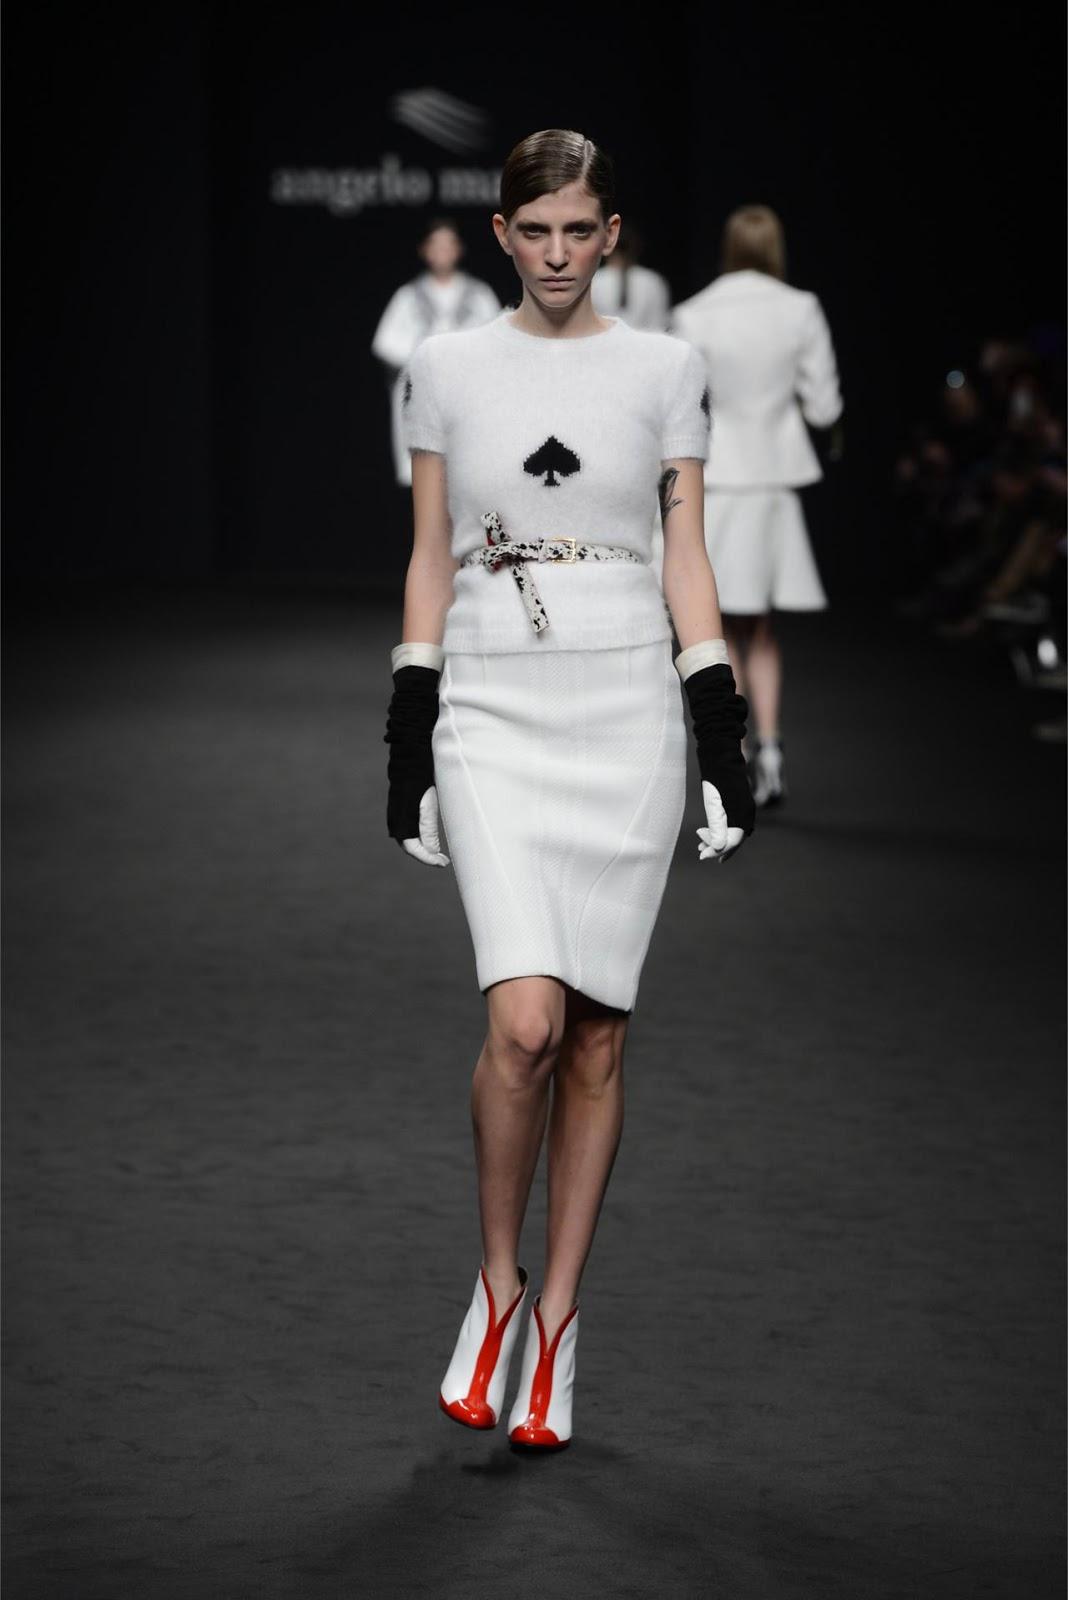 16 angelo marani 2 www.fashion-with-style.com